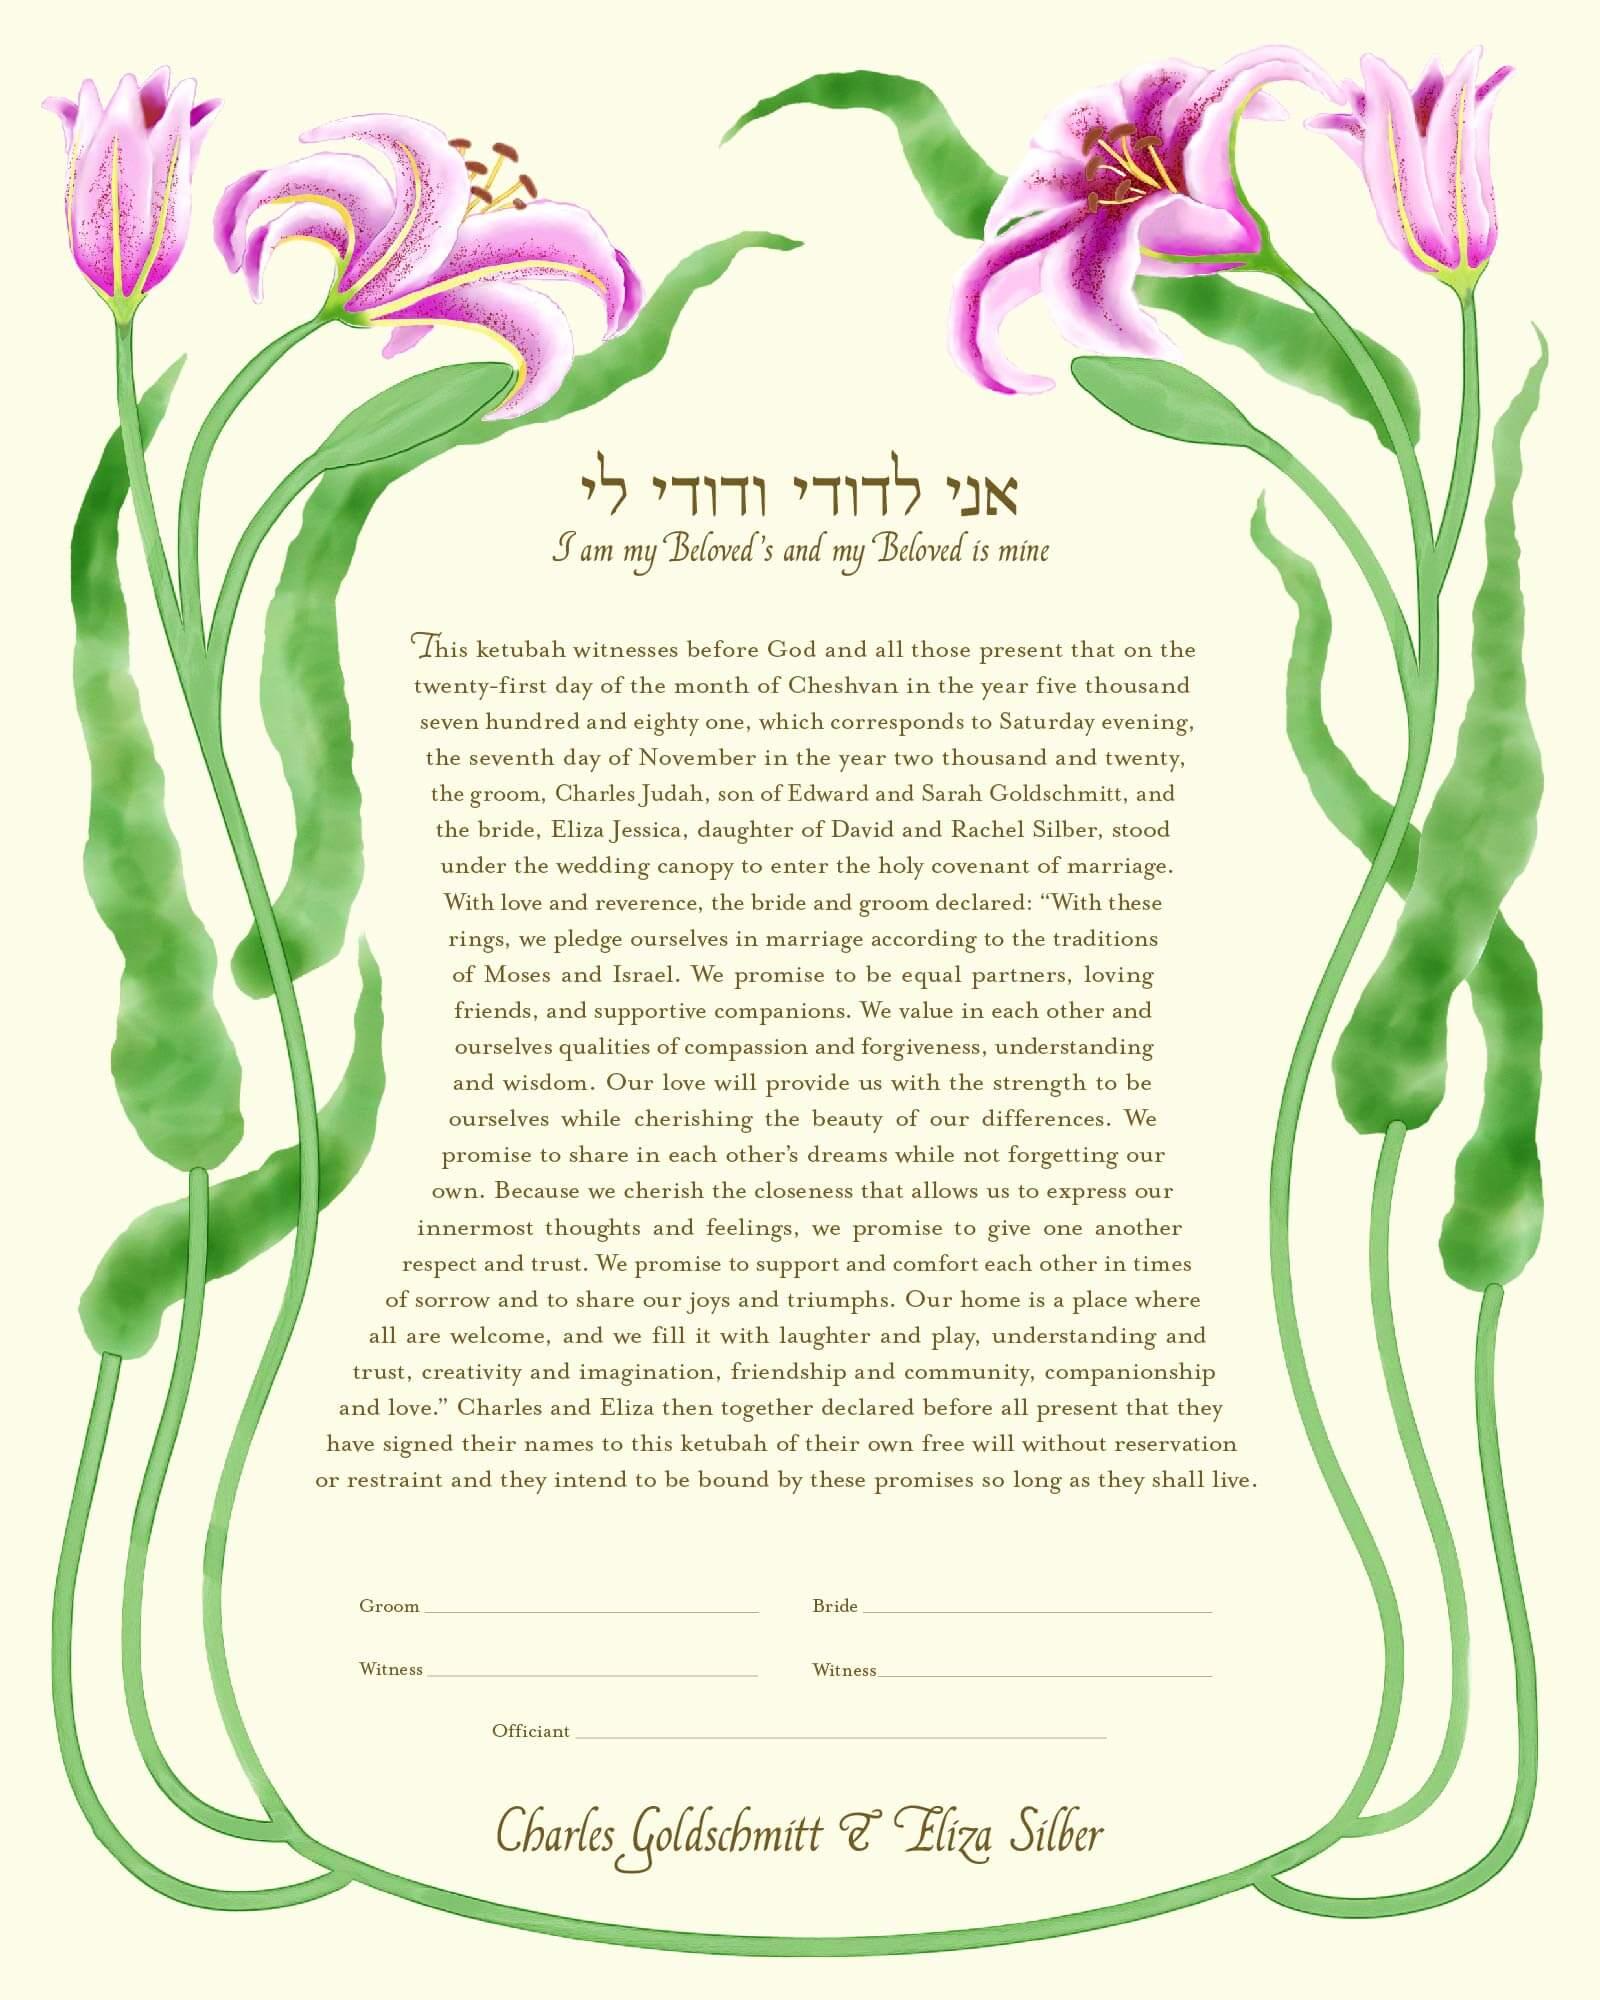 Stargazer Lilies ketubah English.jpg